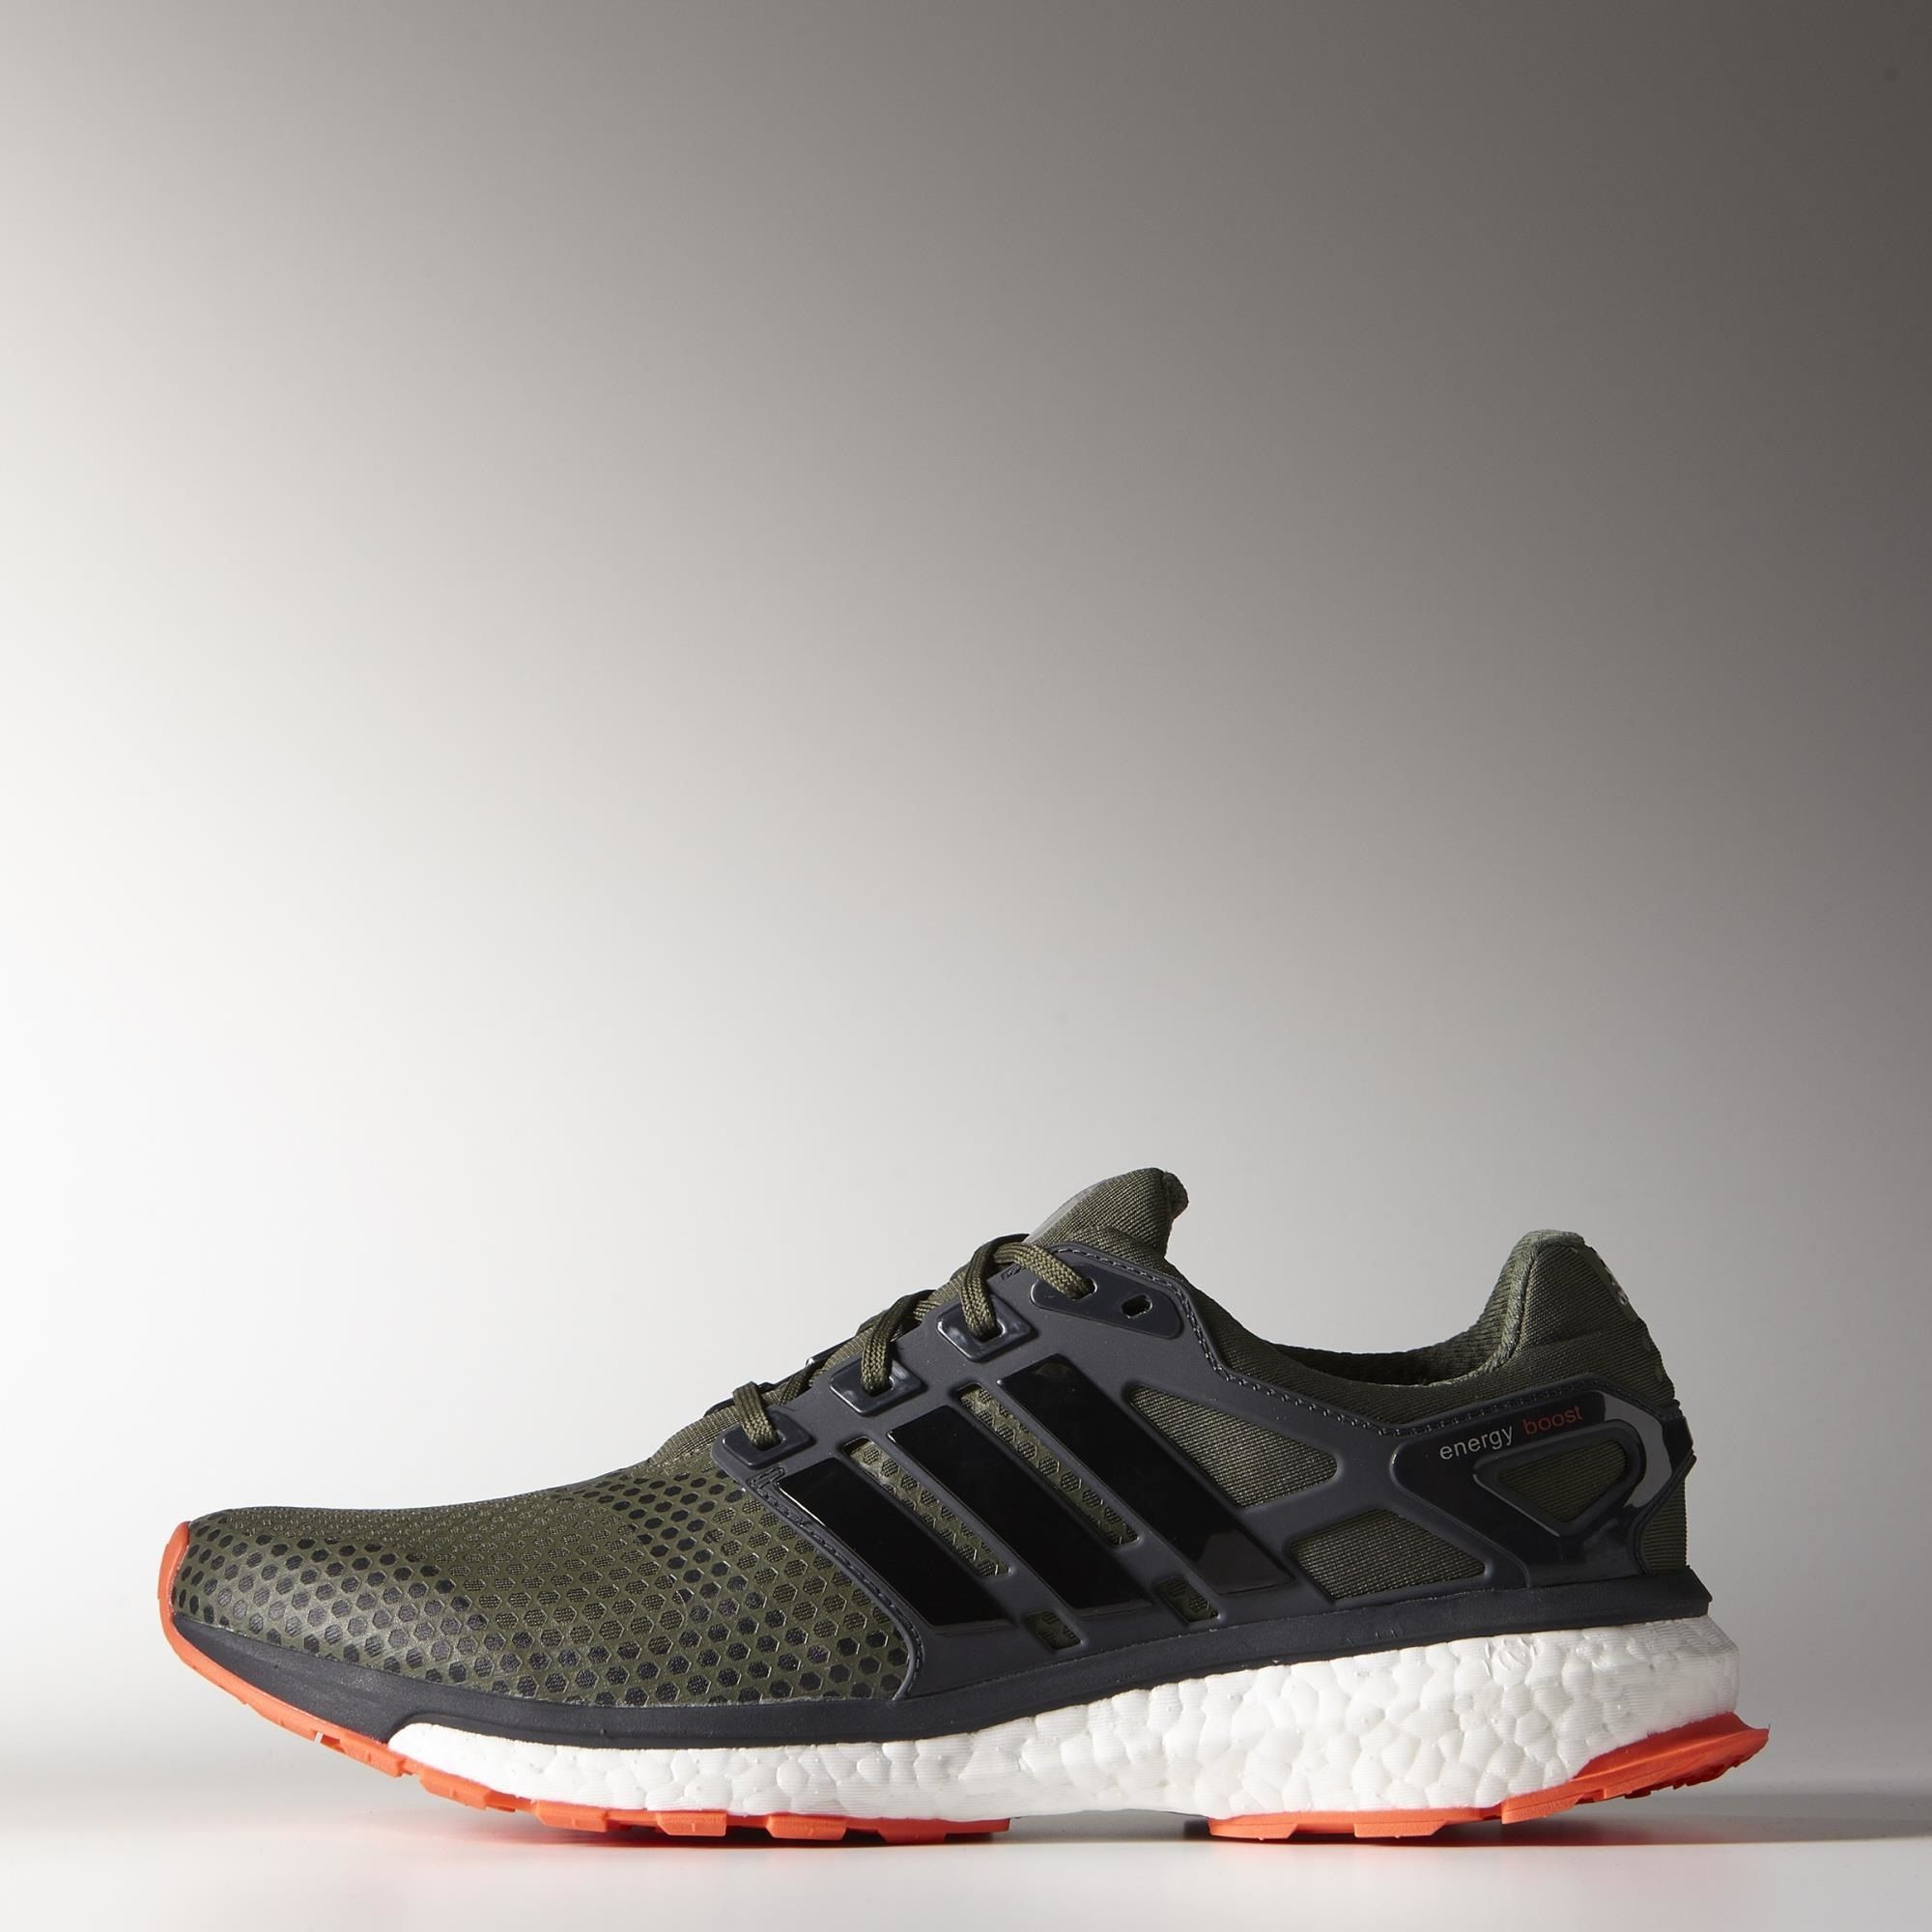 6aaa40c89c1f adidas - Energy Boost 2.0 ATR Shoes